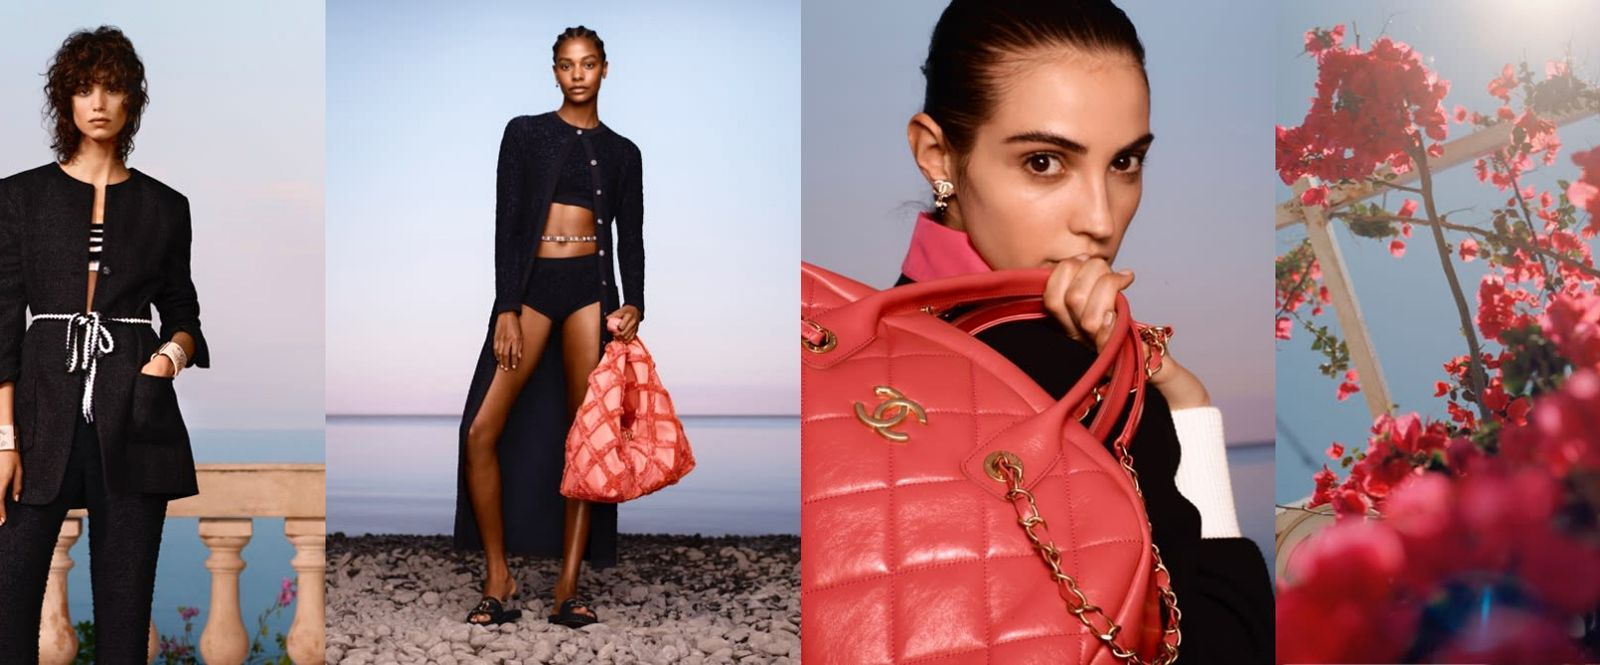 Balade en Méditerranée: Live η νέα Cruise συλλογή του οίκου Chanel 2020/21